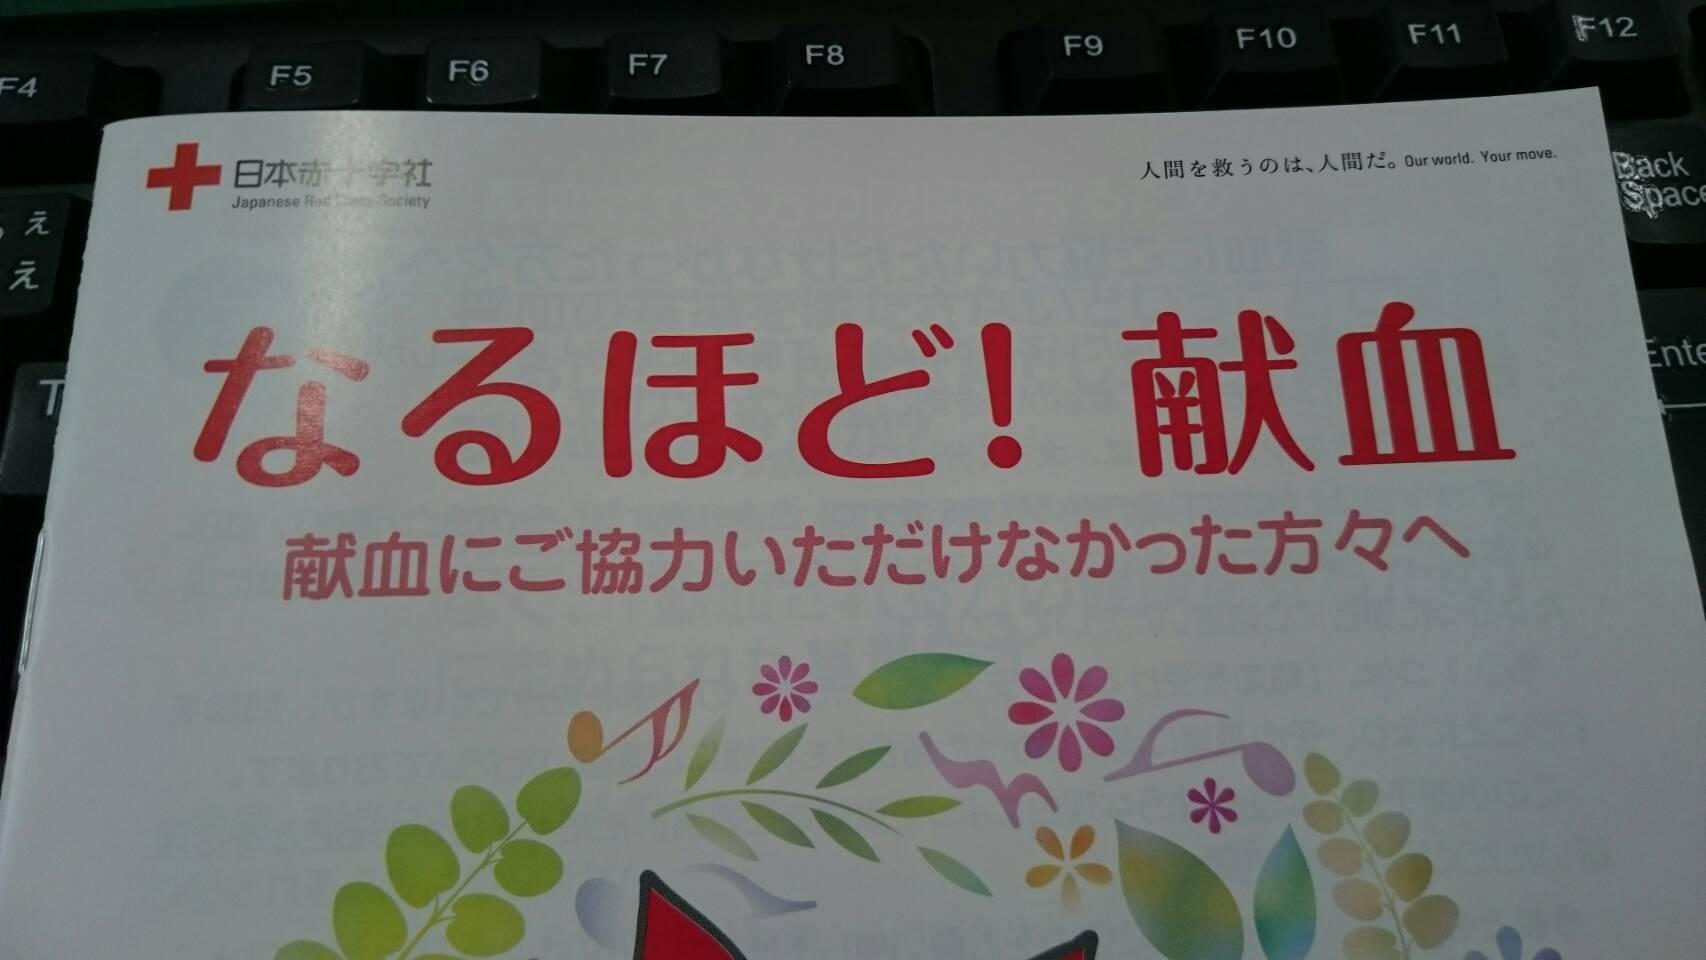 S_7409279661255.jpg